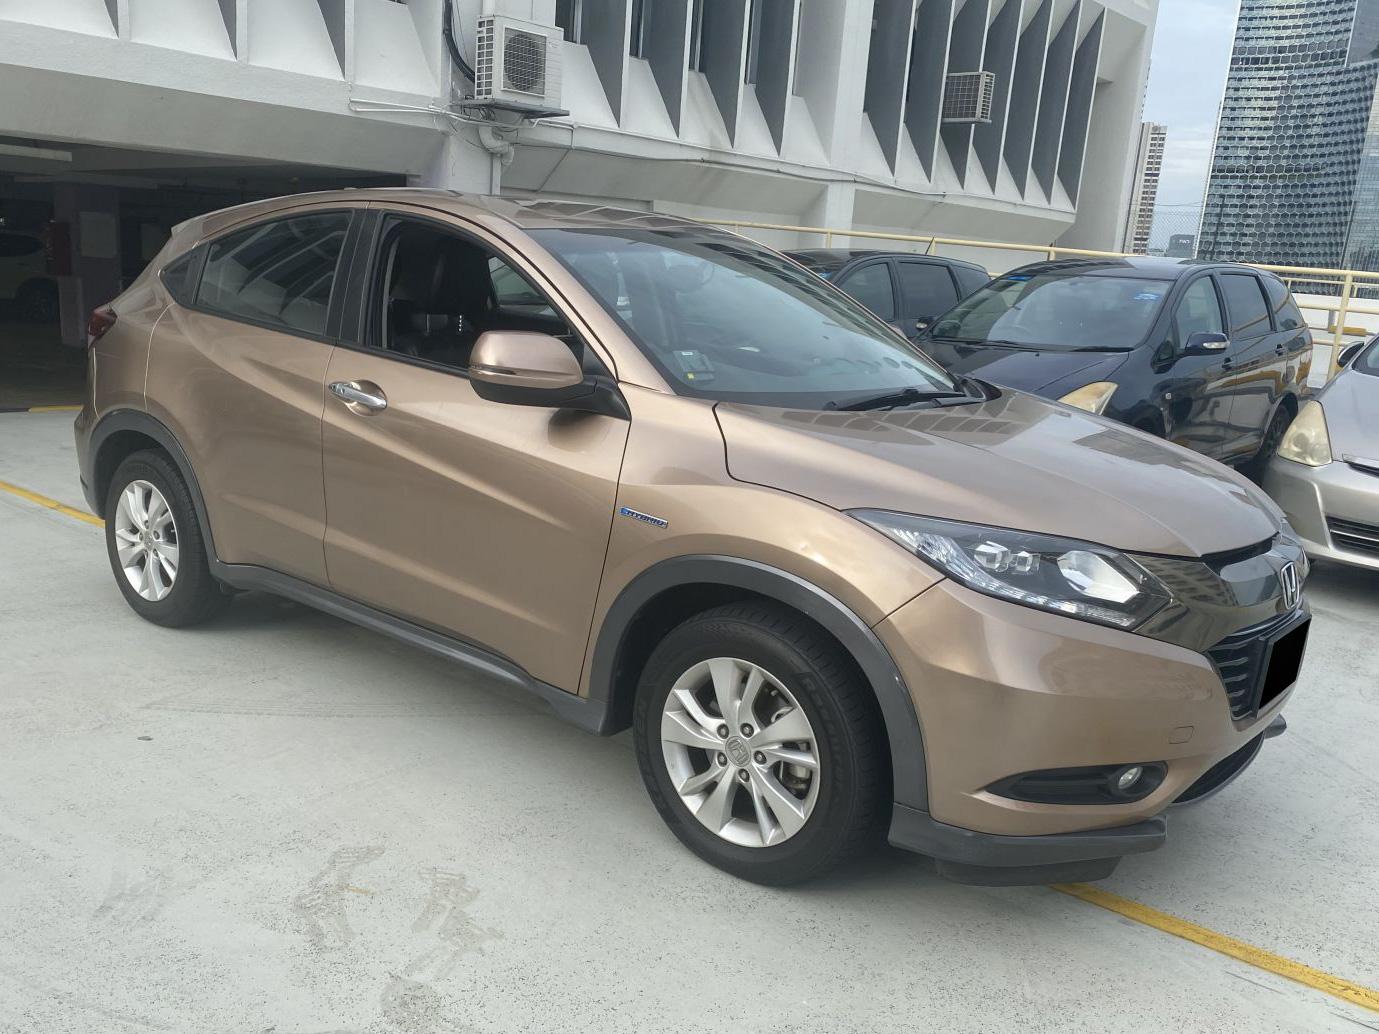 Honda Vezel 1.5A (PHV Private Hire Rental)